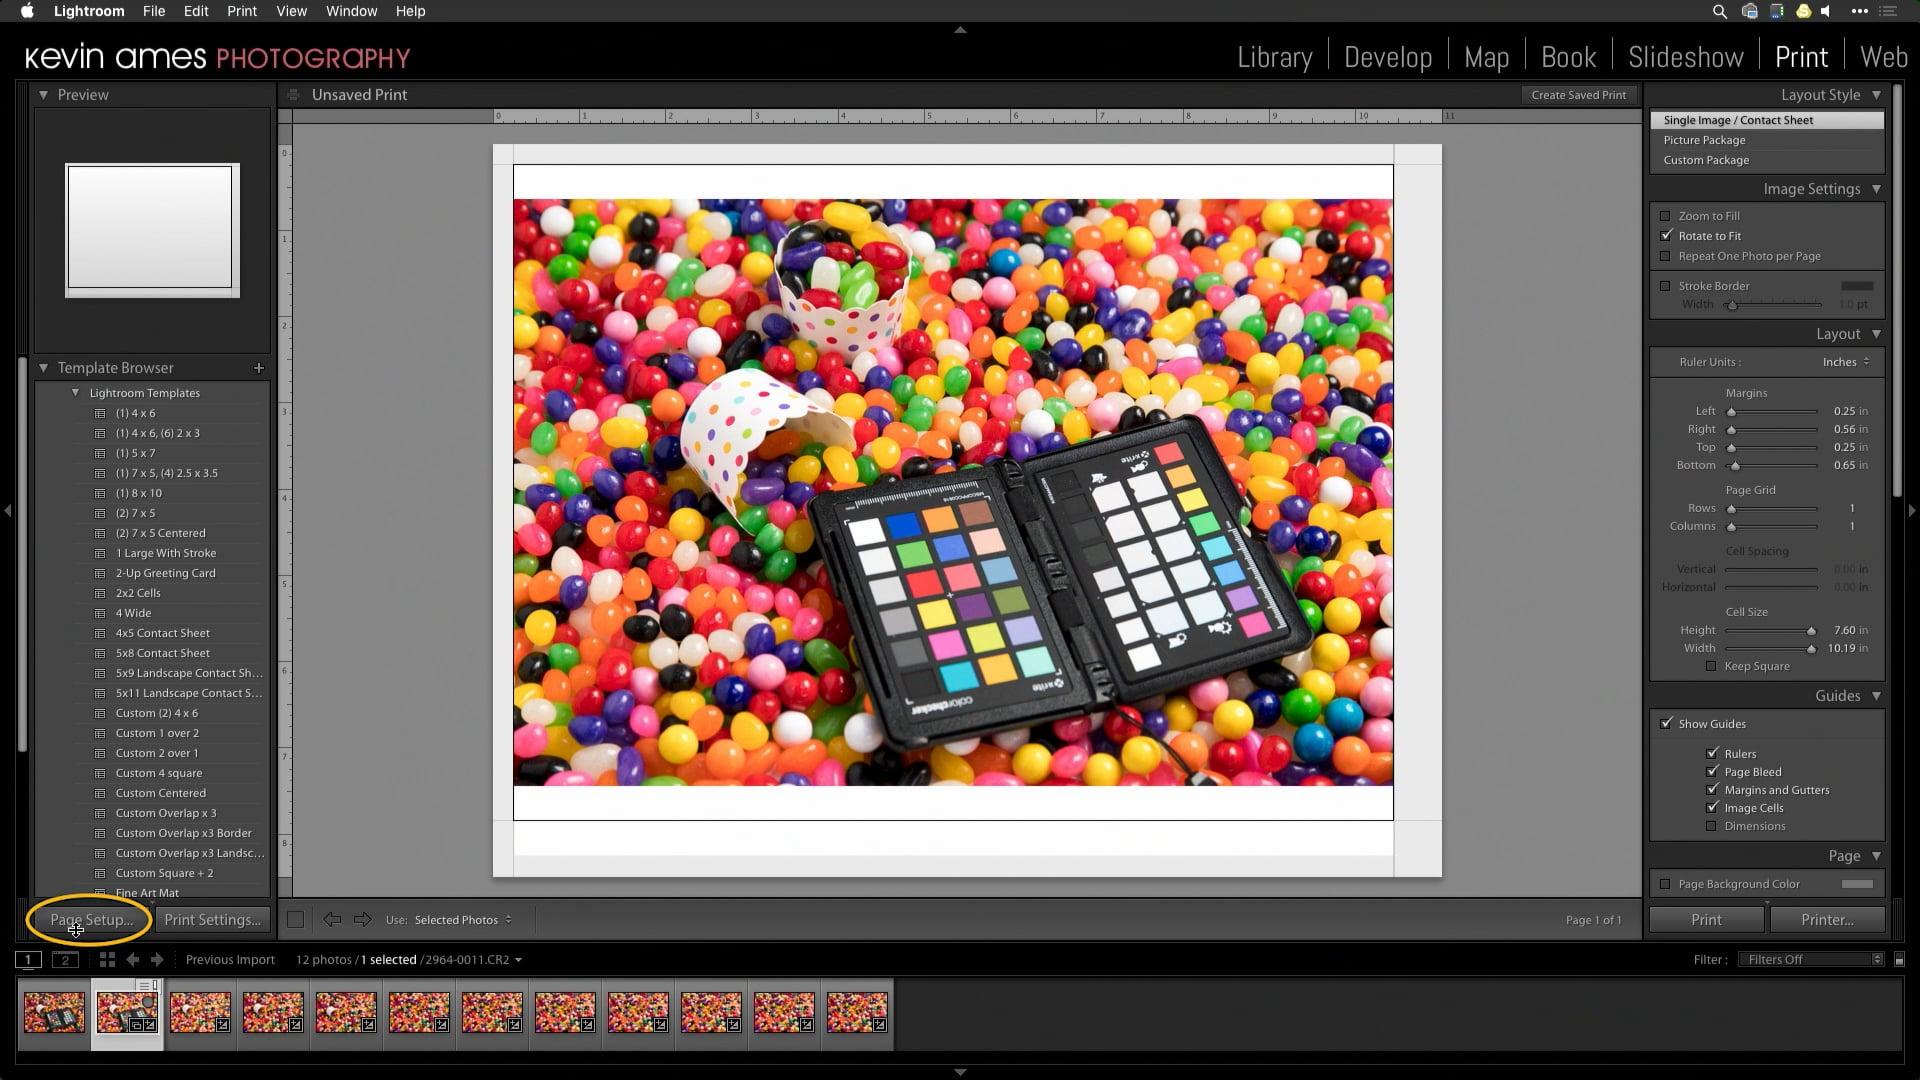 009_49_05_07_CustomPrintProfileLightroom - vimeo